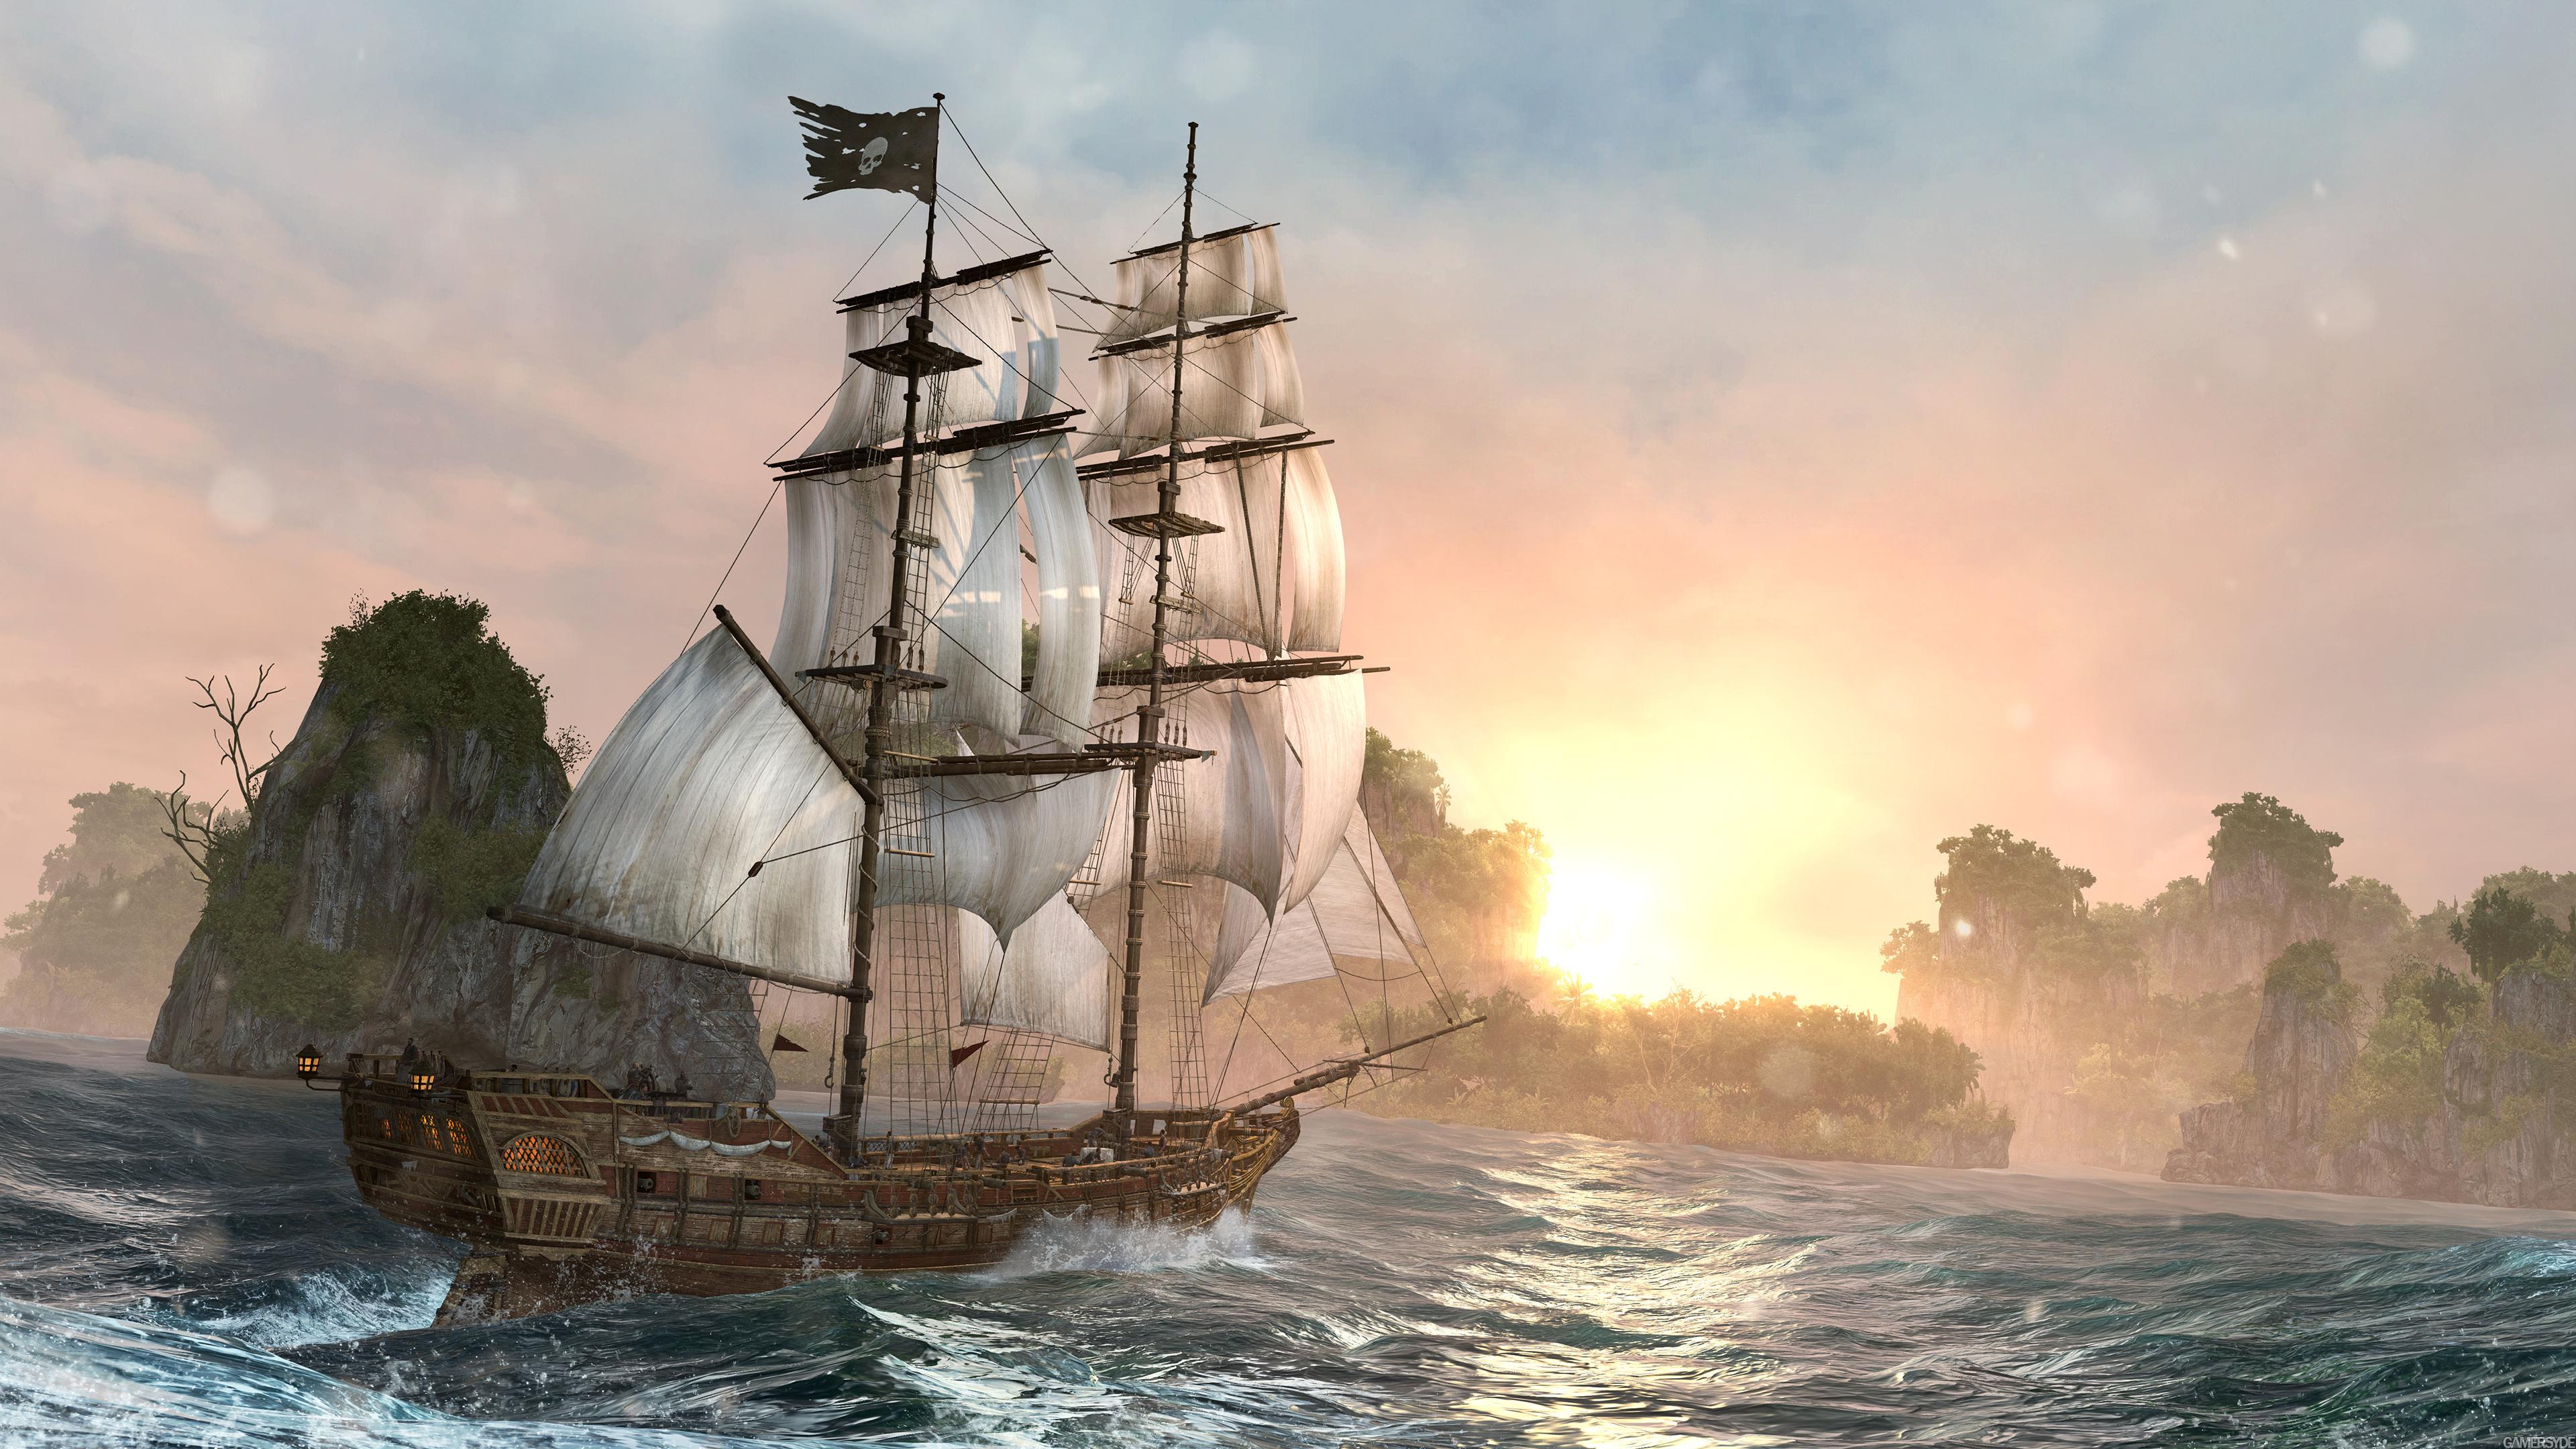 game ship river hd sunrise ultrahd 4k wallpaper wallpaper background 3840x2160